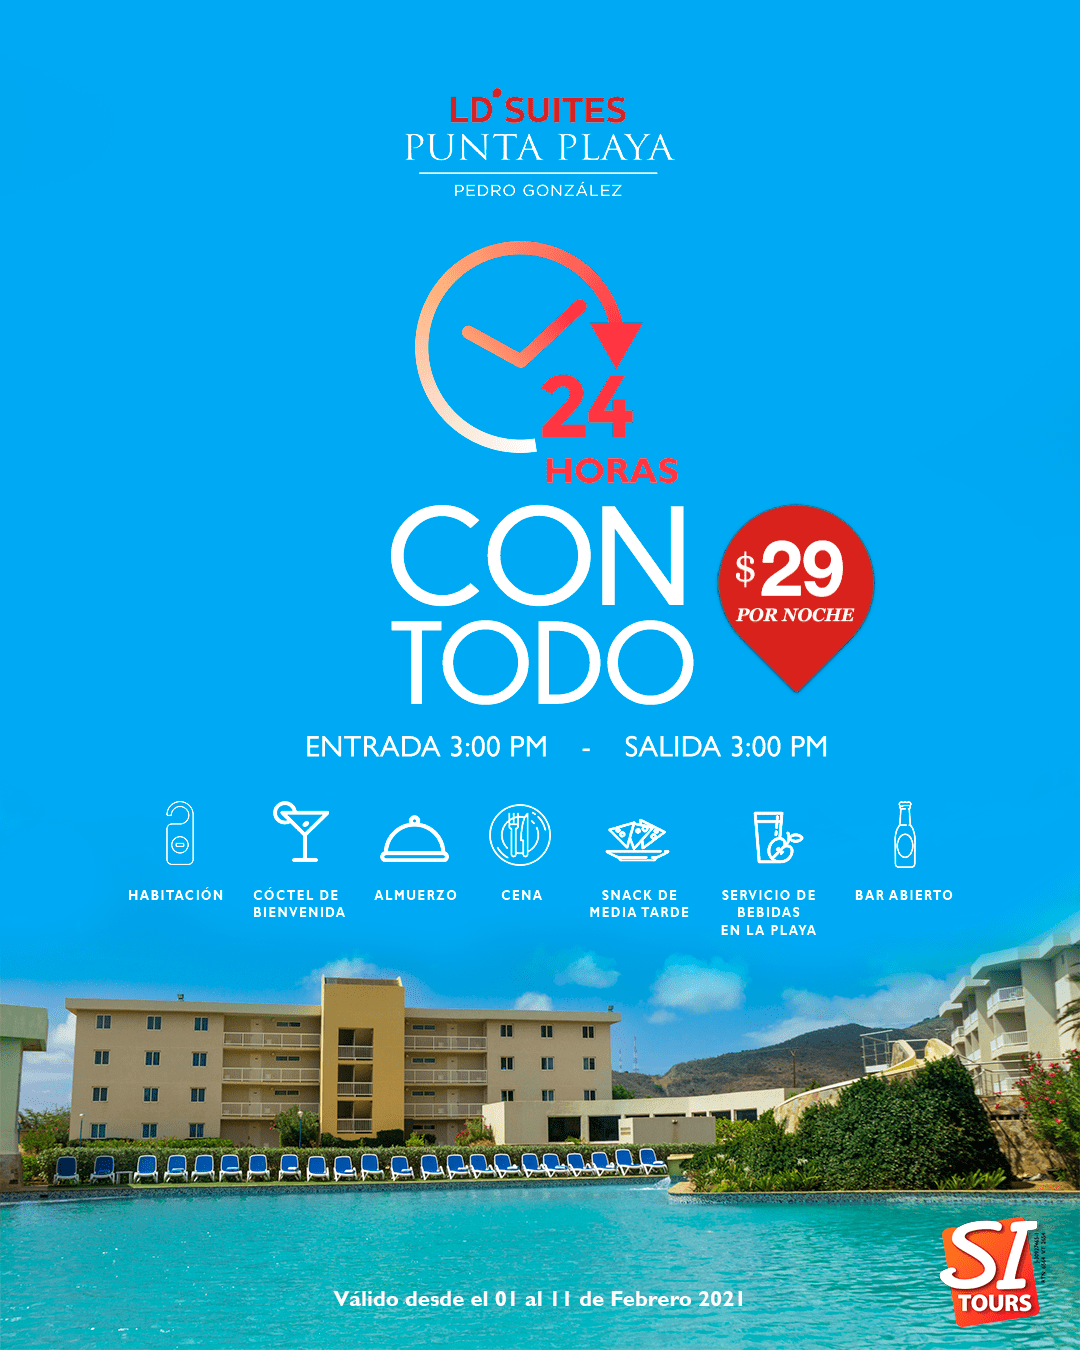 24 Horas LD Suites Punta Playa